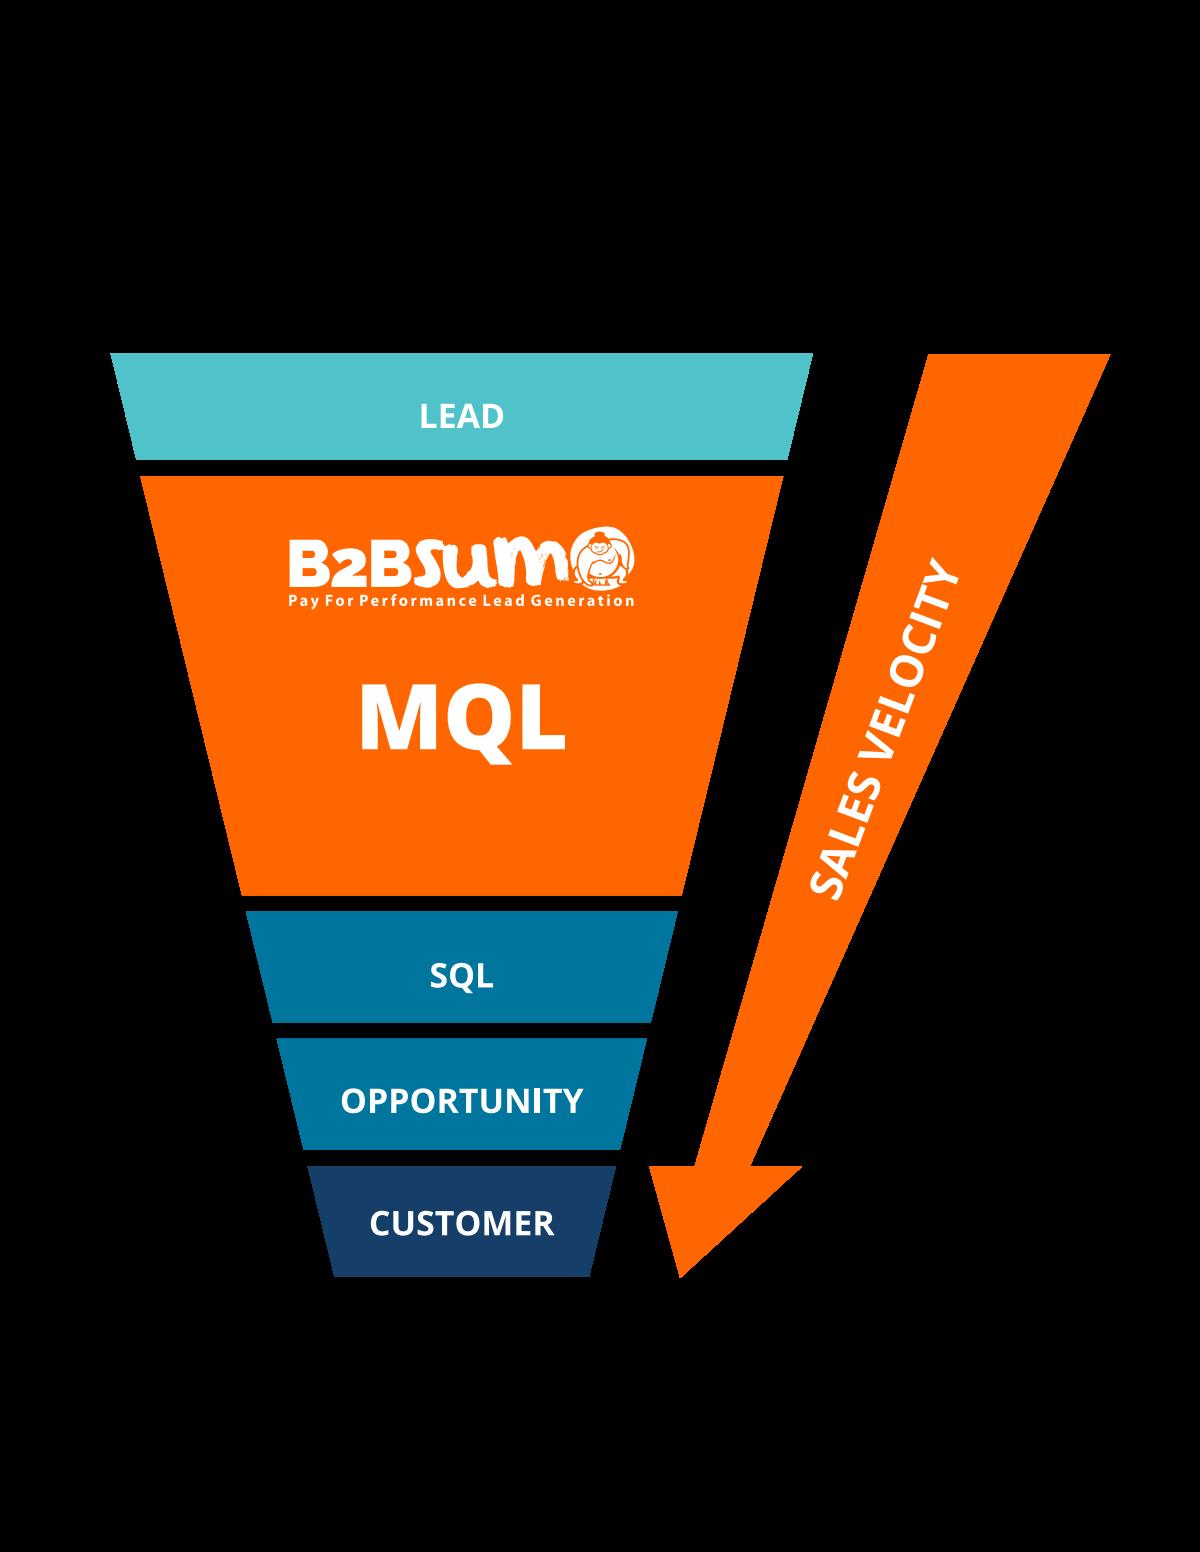 Explanatory Diagram for B2B Sumo